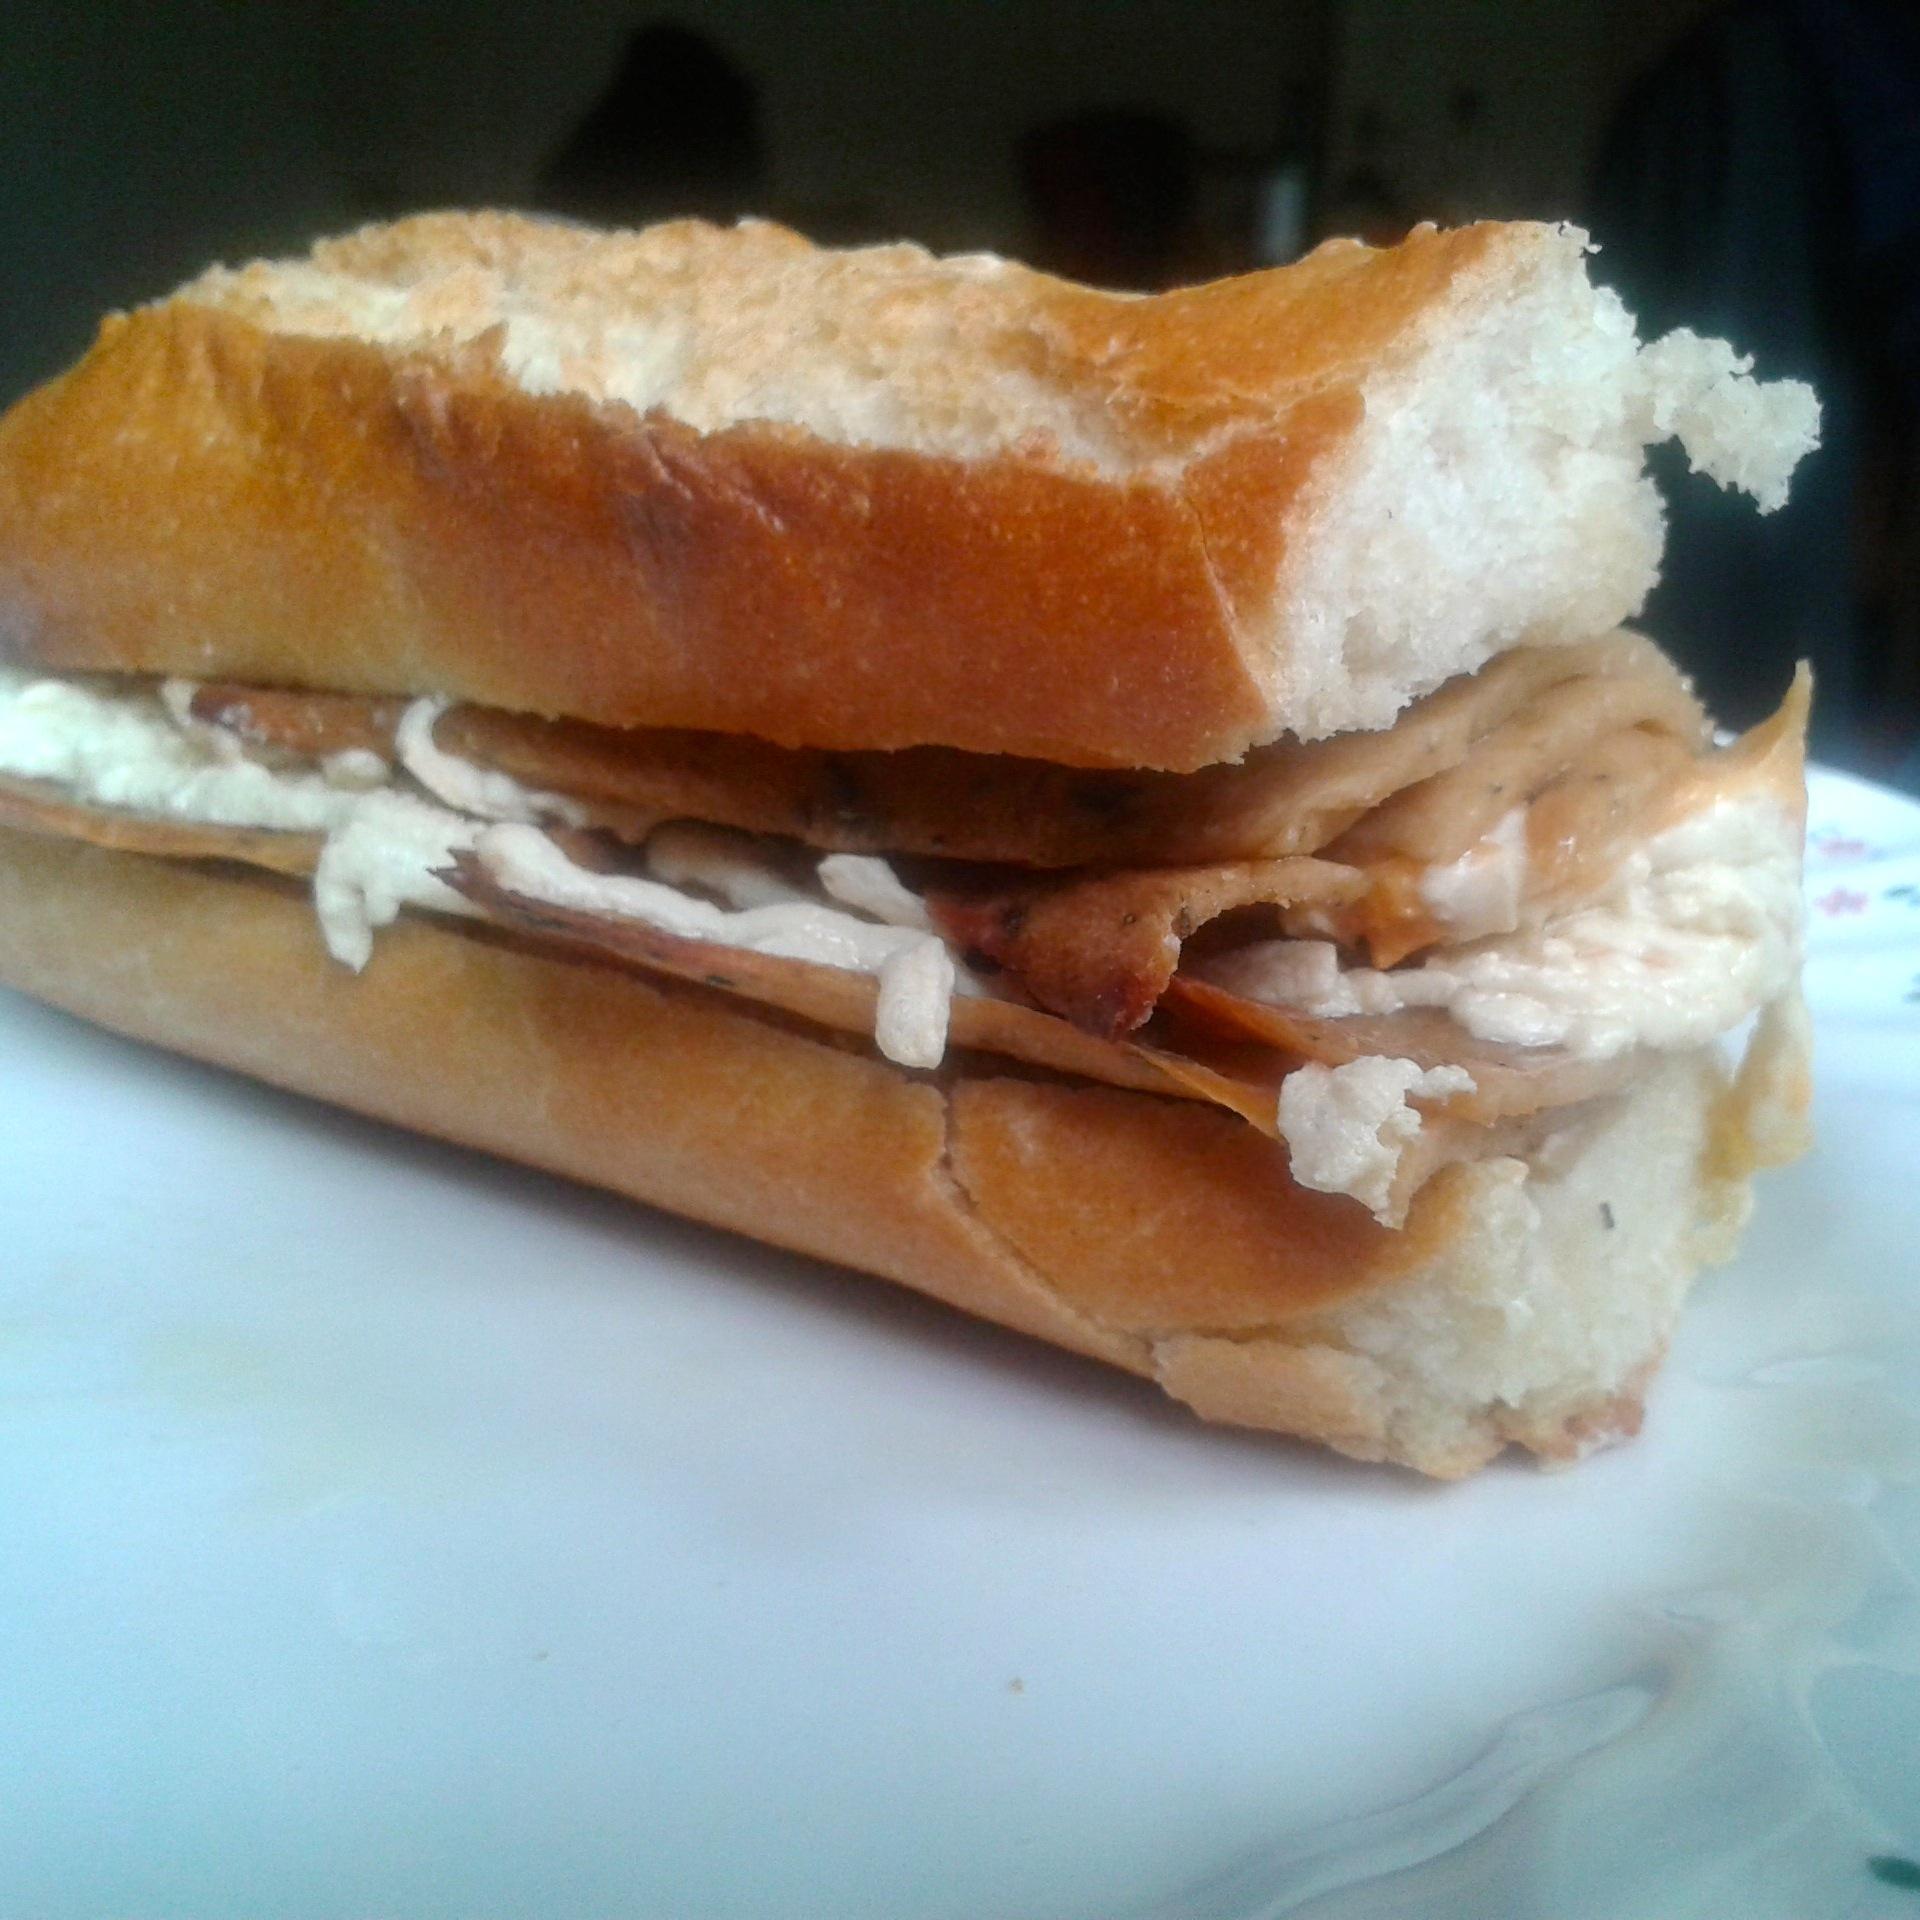 https://i1.wp.com/fatgayvegan.com/wp-content/uploads/2014/07/sandwich.jpg?fit=1920%2C1920